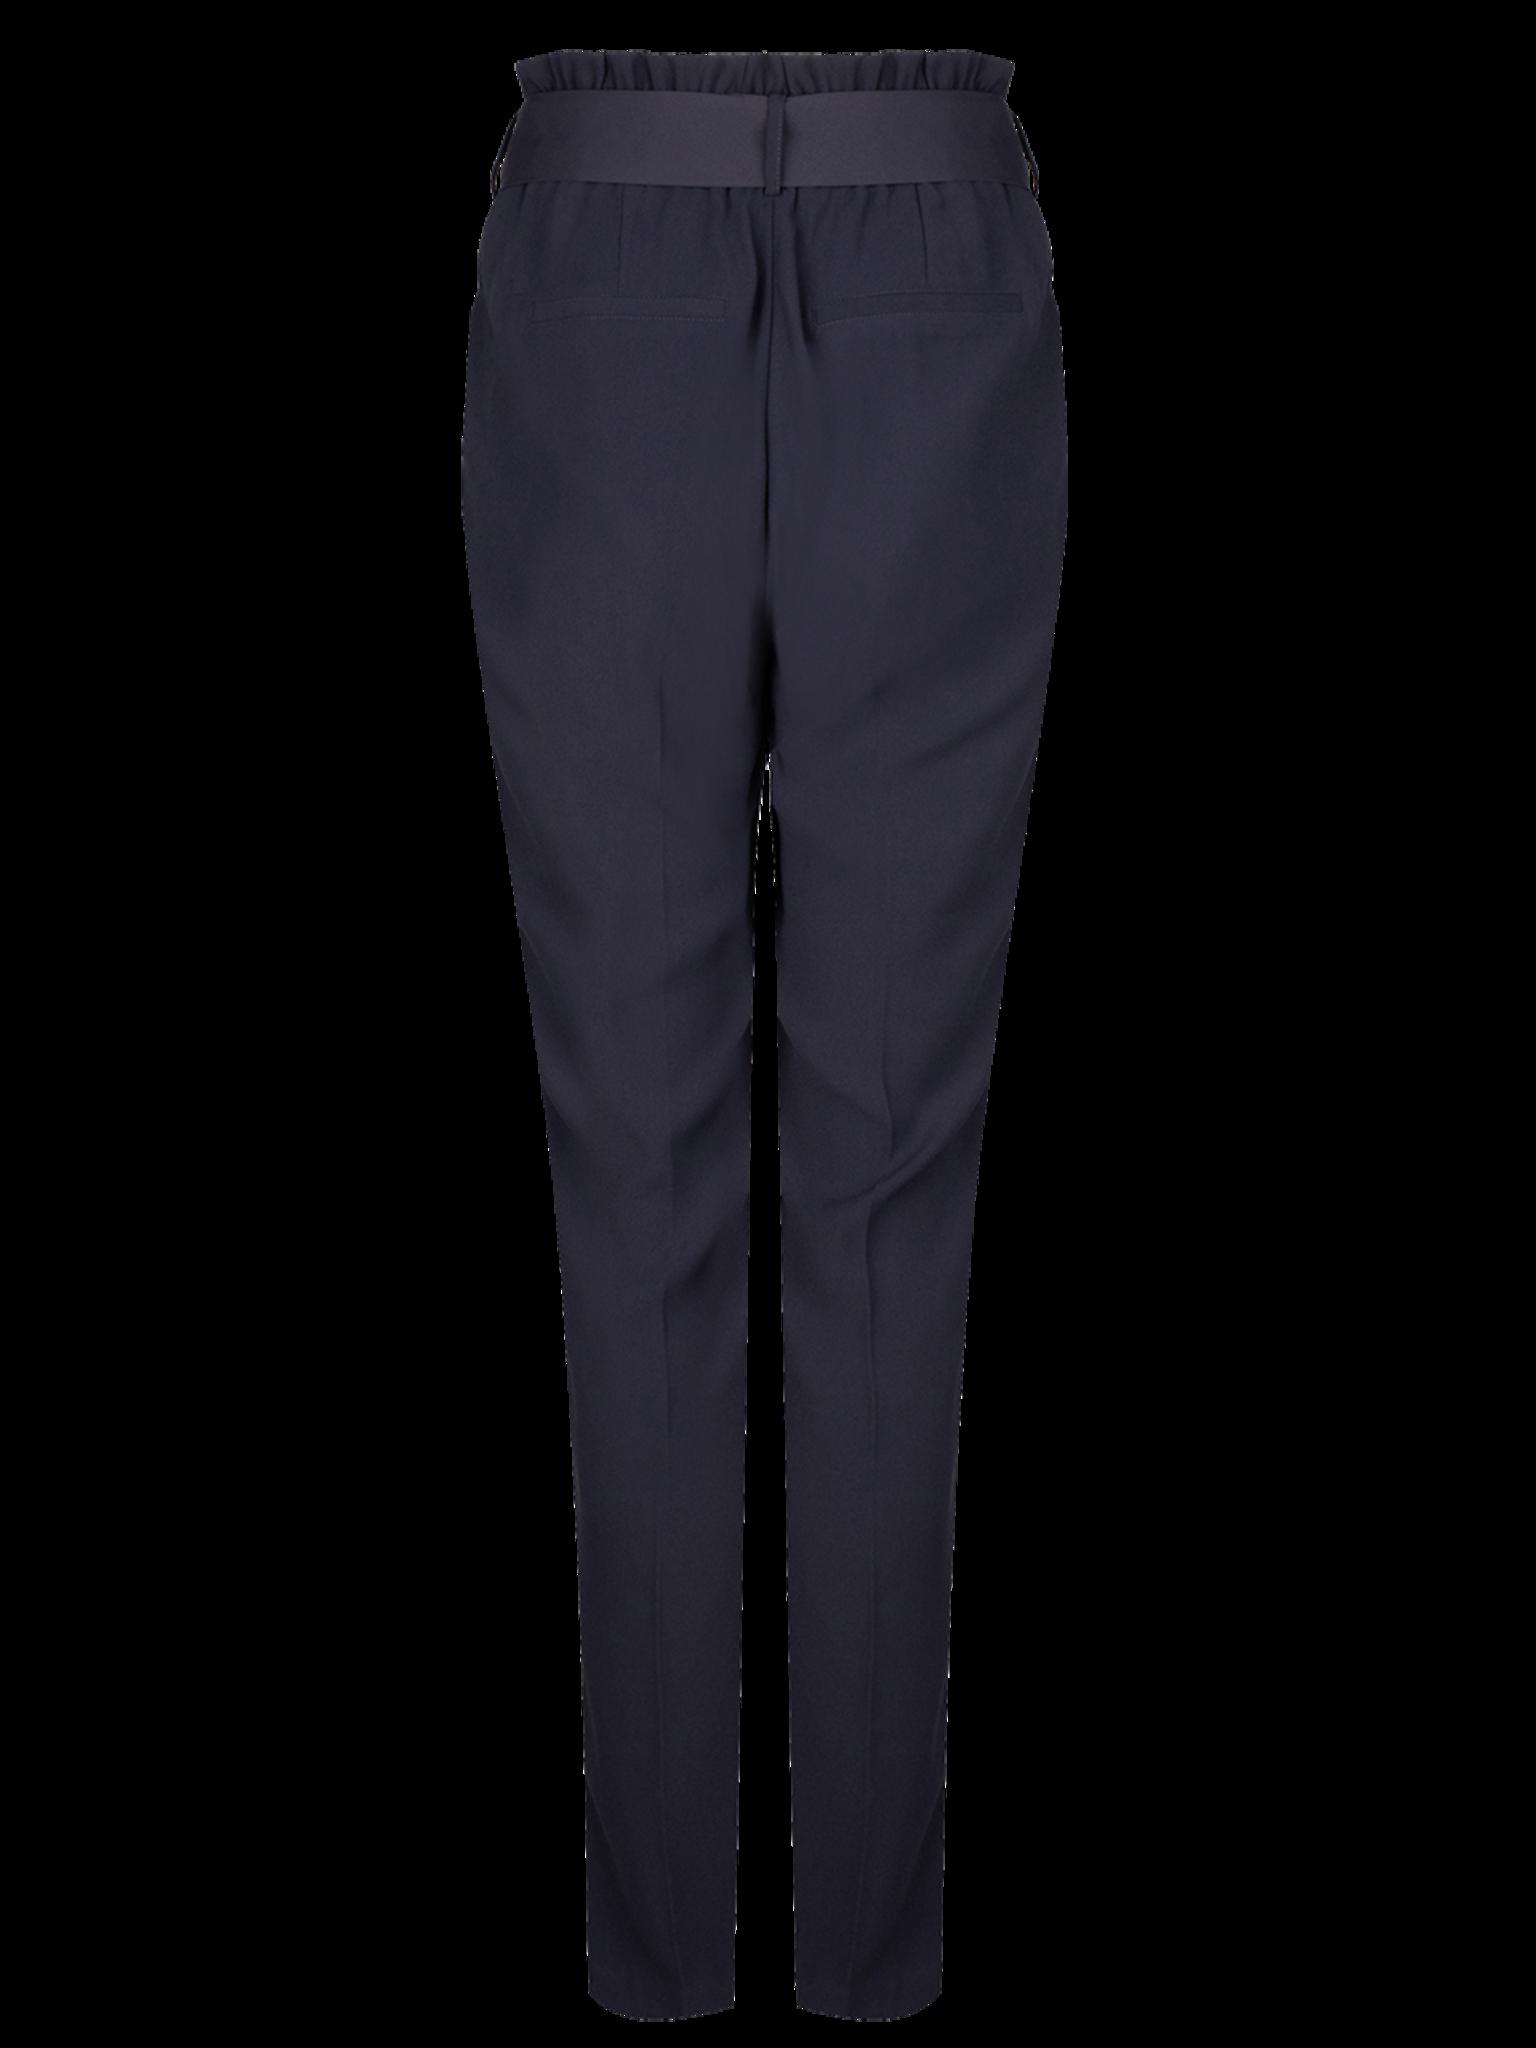 Dante 6 Trouser 211518 BRANDOO-2